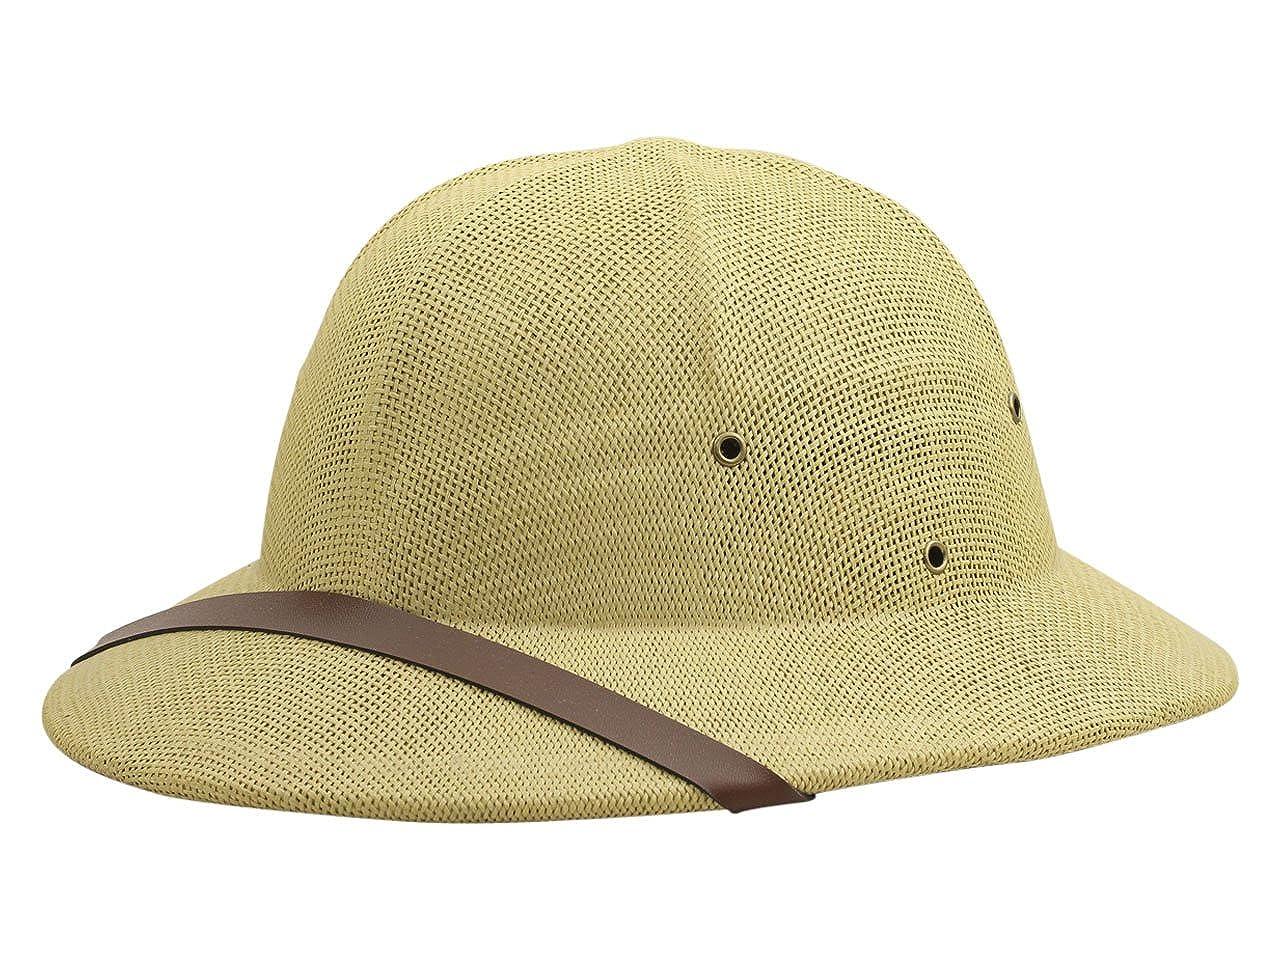 Dorfman Pacific Co. Men's Fine Twisted Toyo Pith Helmet Tan One Size MS414-TAN